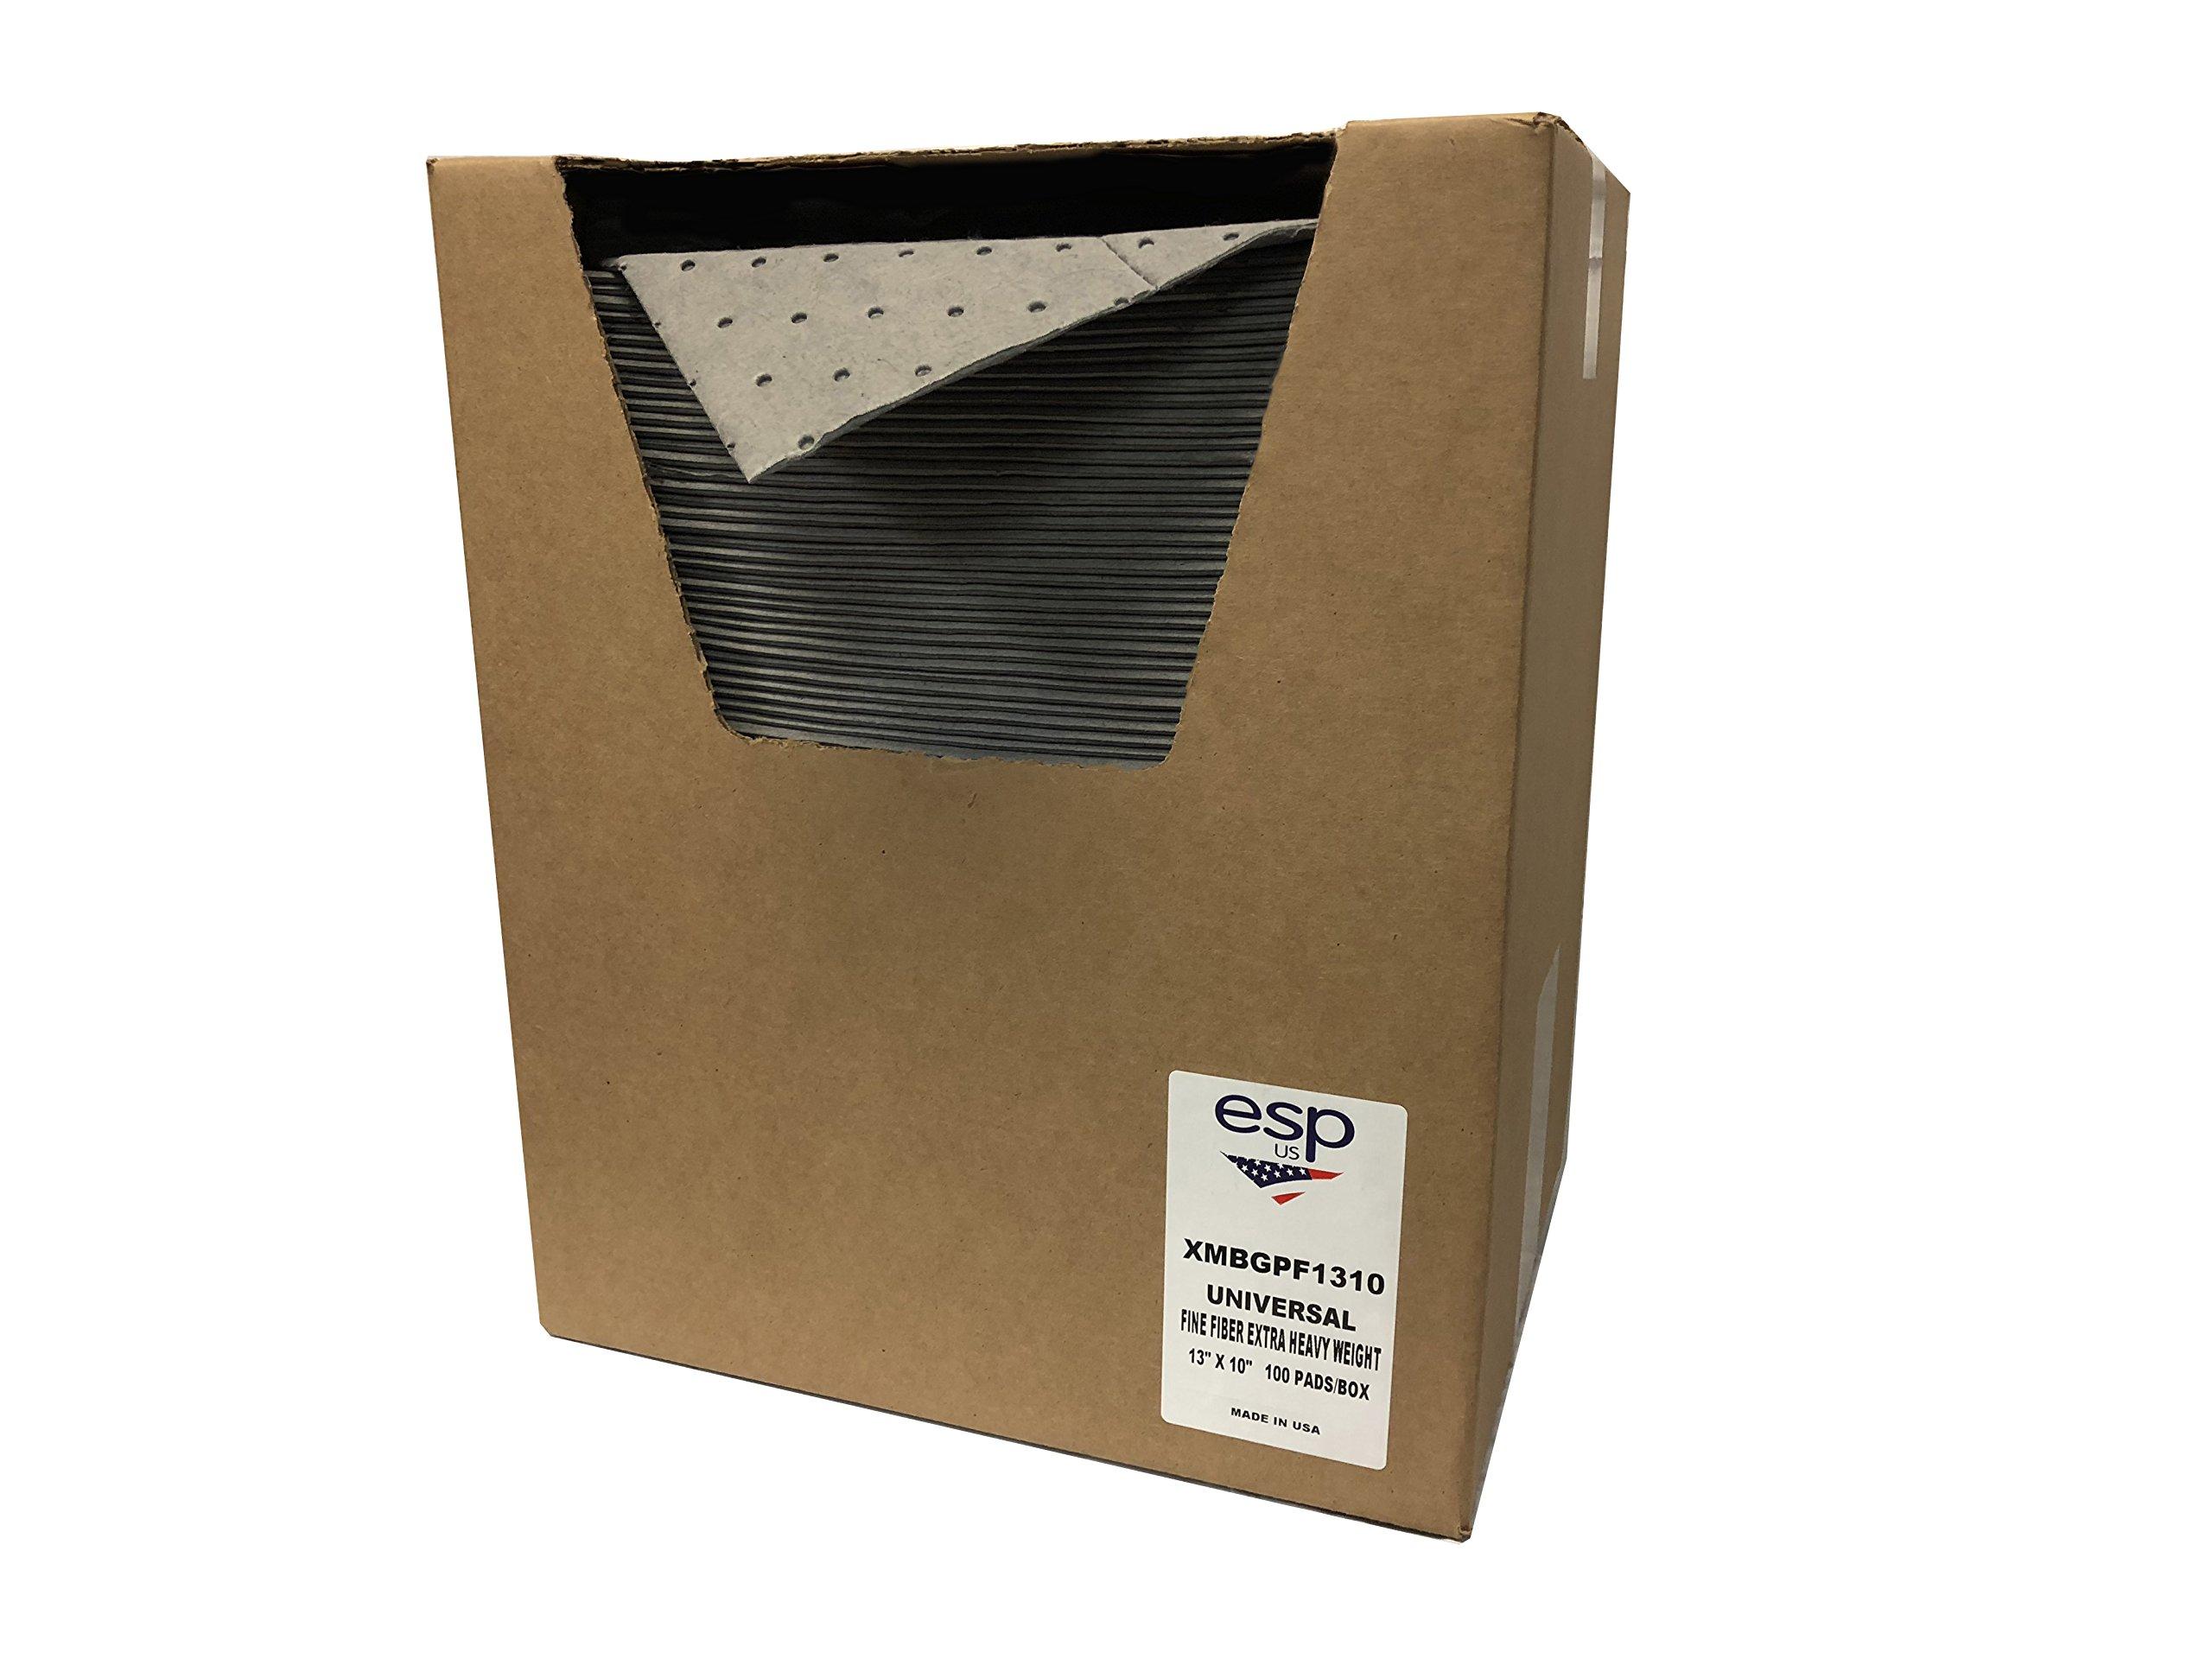 Evolution Sorbent Products XMBGPF1310 Extra Heavy Absorbent, 12 Gal Capacity, Polypropylene, Gray Pad (13'' x 10'') 100/Box